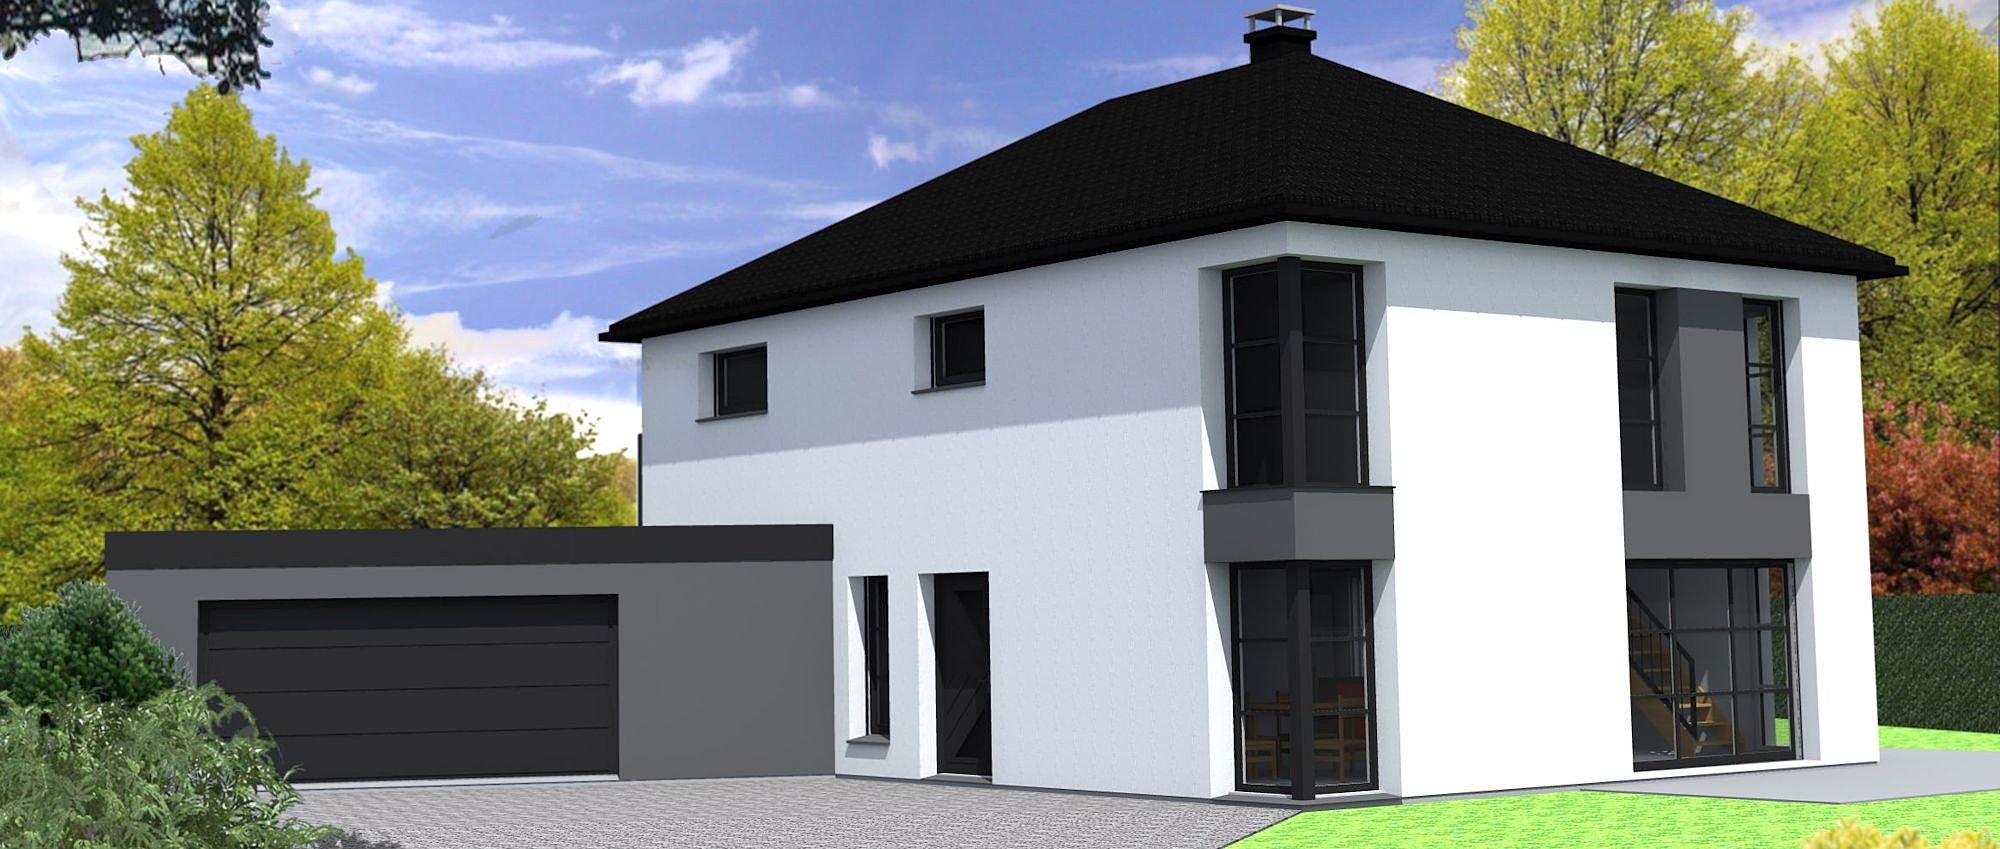 Maison moderne avec volets for Maison moderne 57